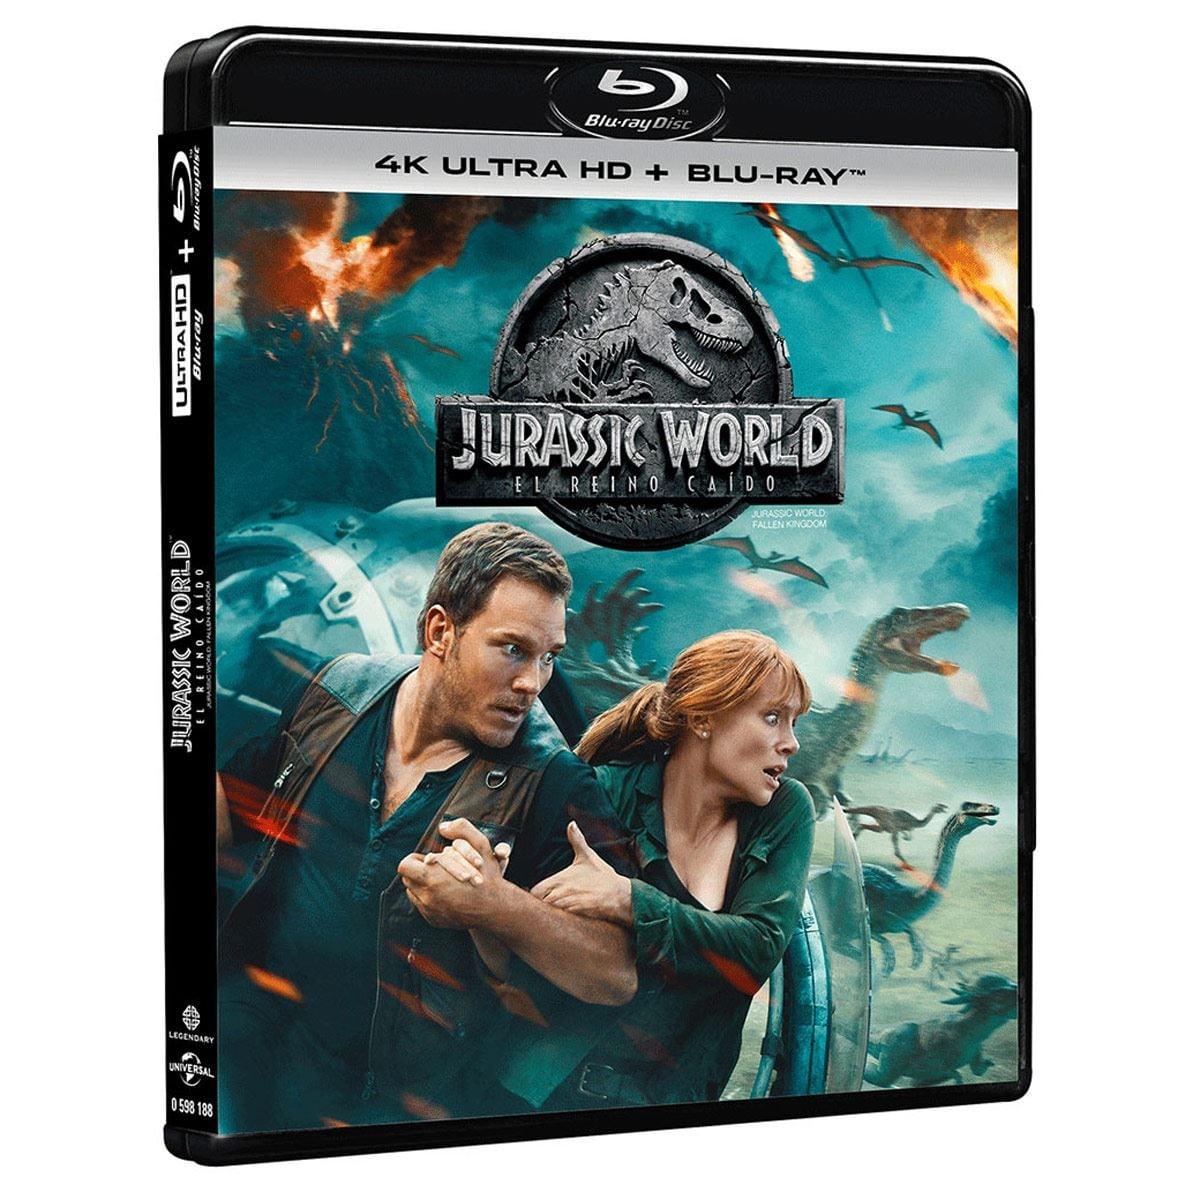 4K UHD Jurassic World Reino Caído